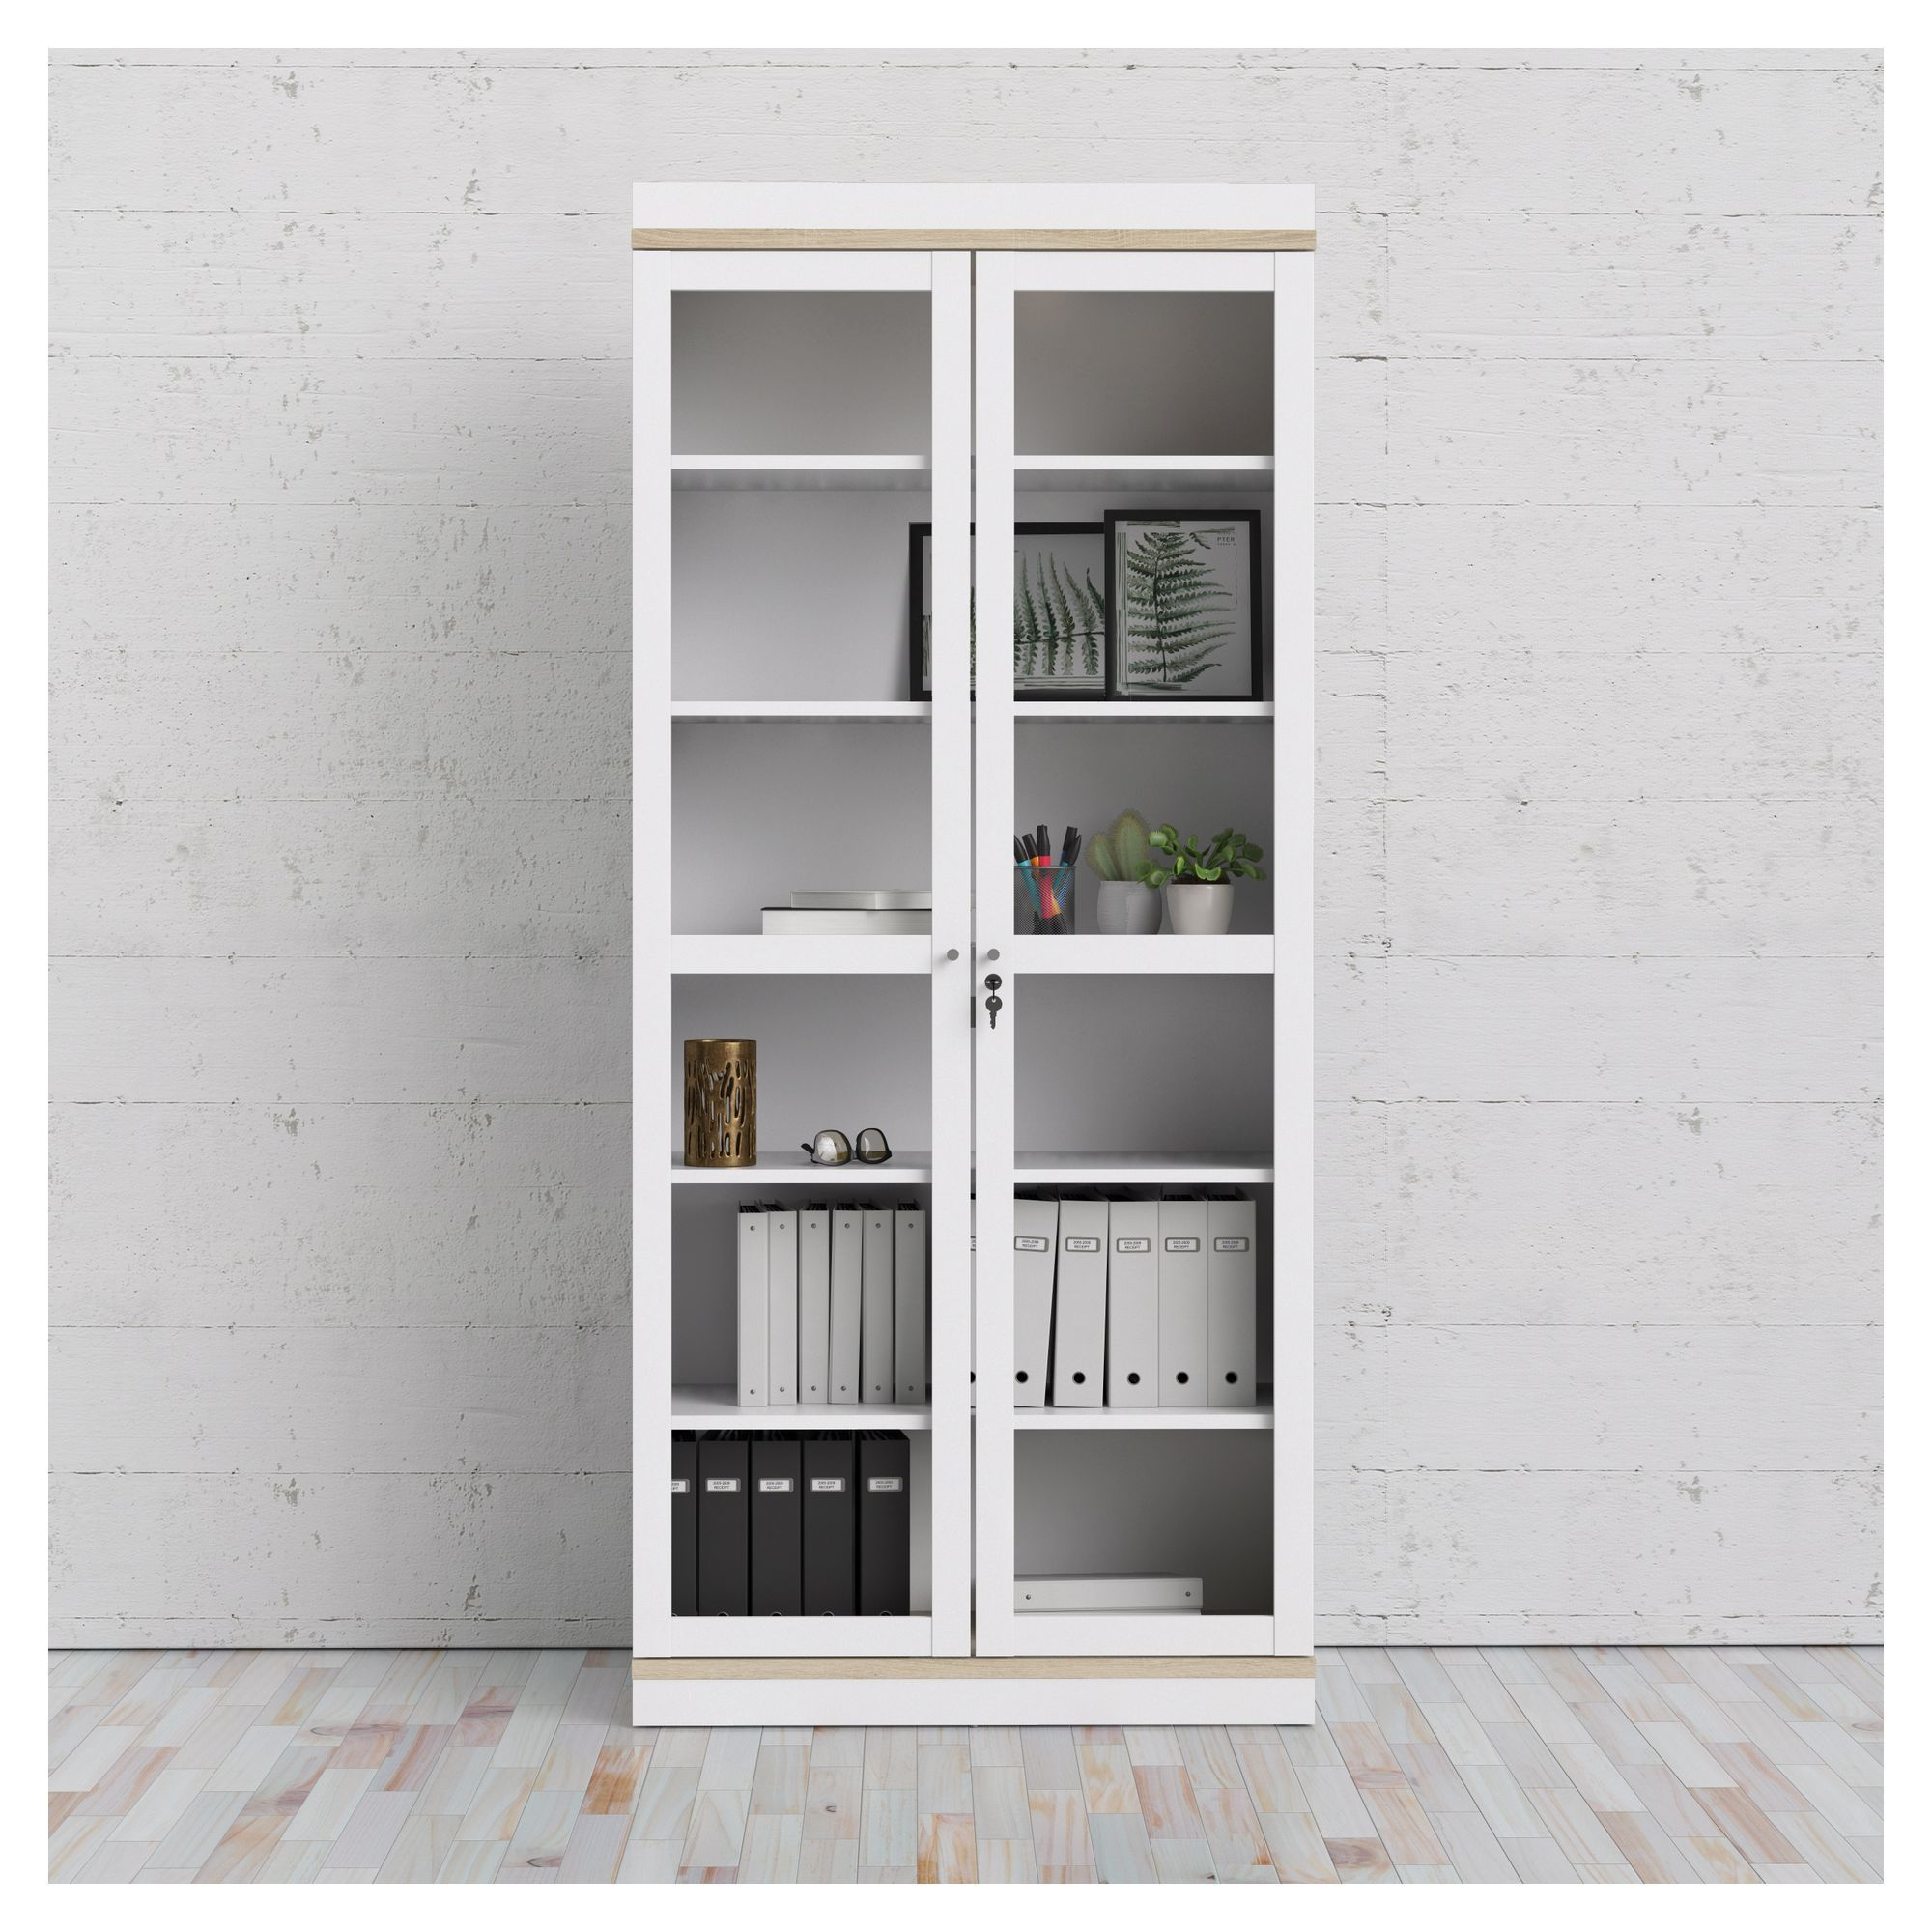 Roomers Vitrineskab - Hvid - Hvidt vitrineskab med glaslåger